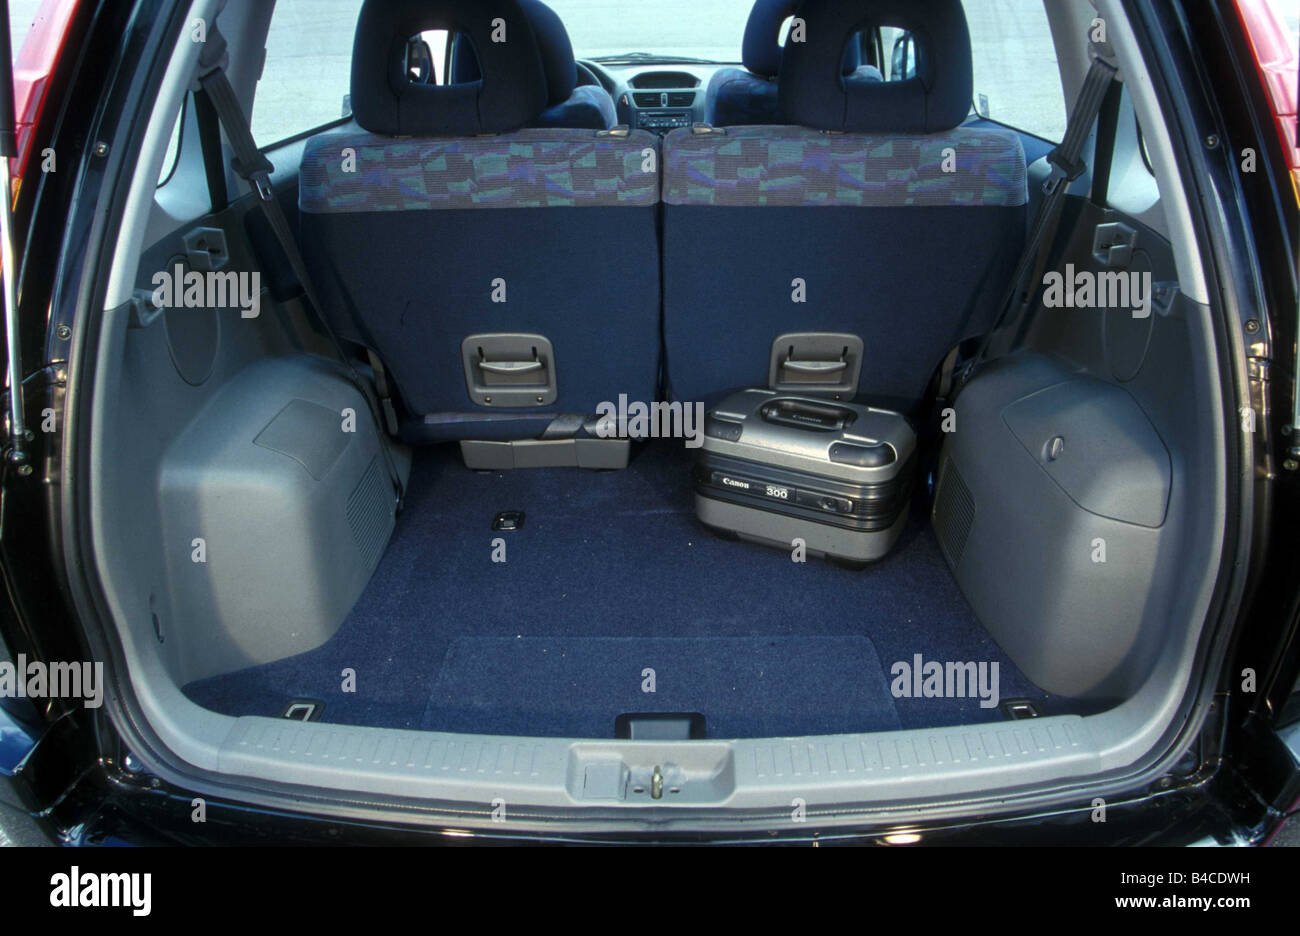 Car, Mitsubishi Space Runner, Van, model year 1999-, black